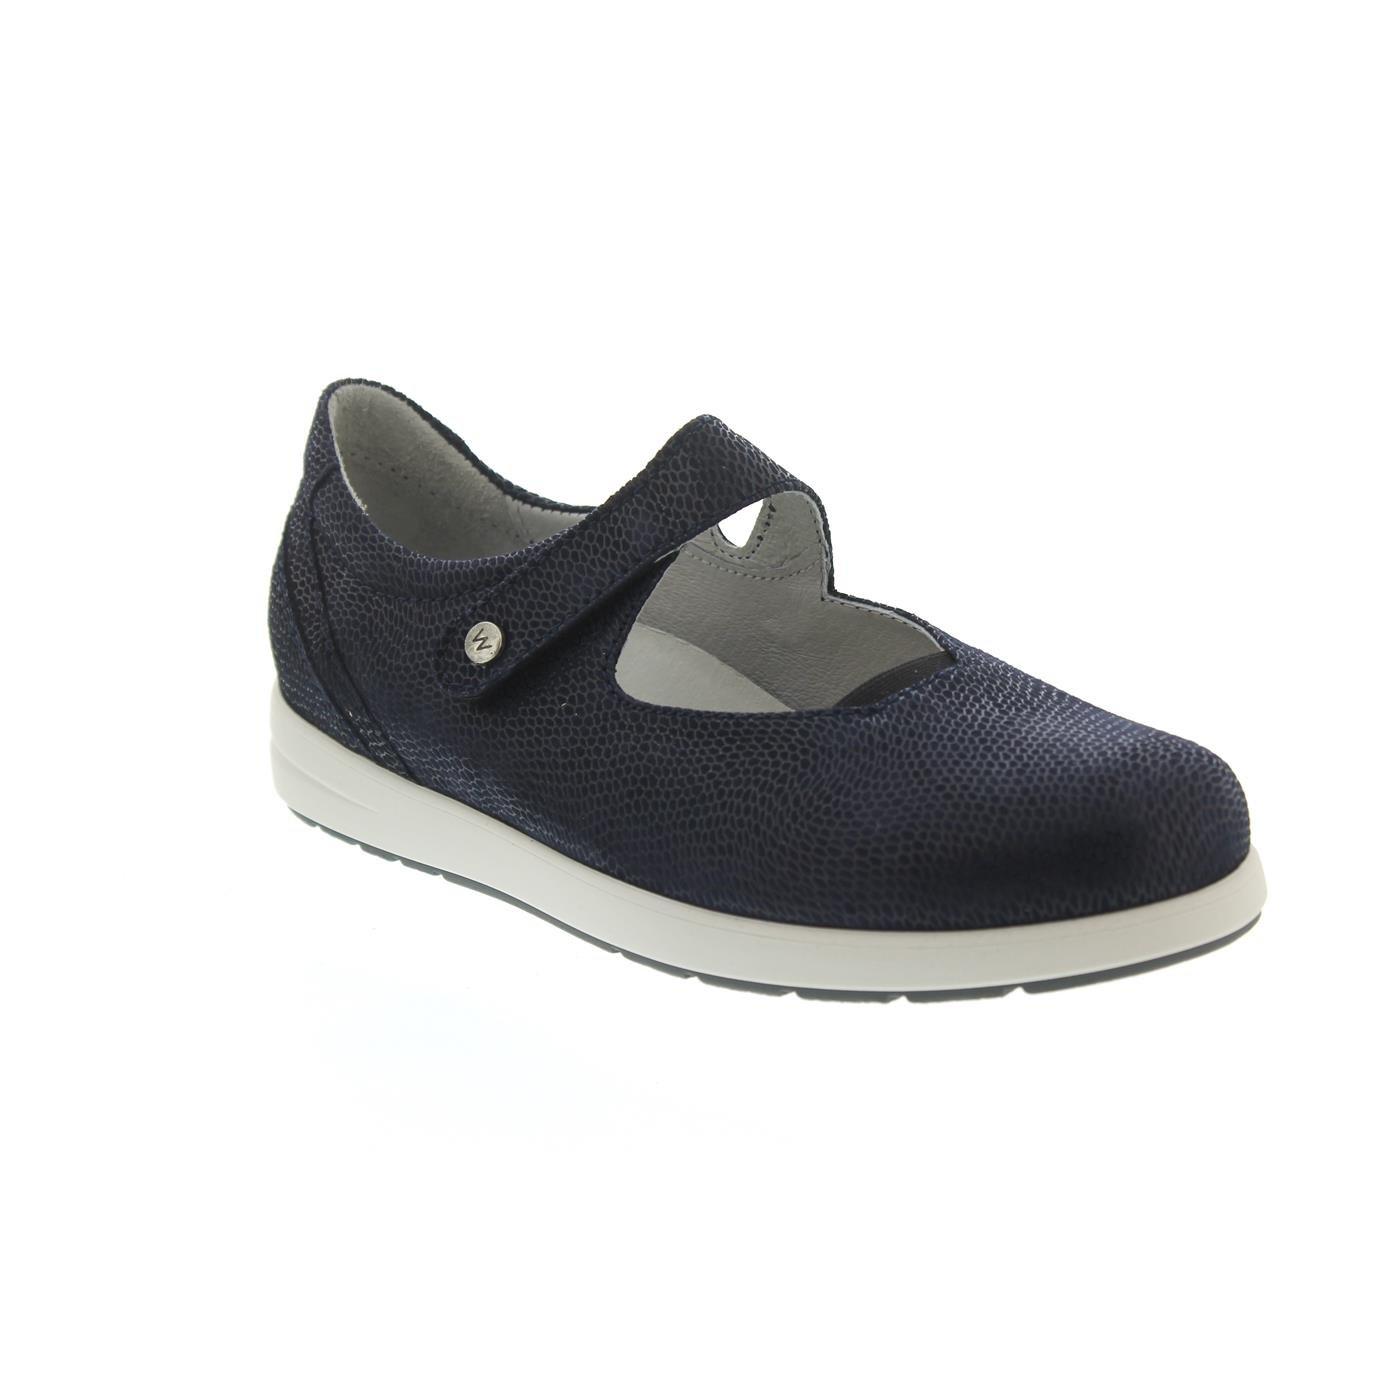 Wolky Damen Slipper Braun 0242120150 Braun Slipper 416982 Blau 931e46